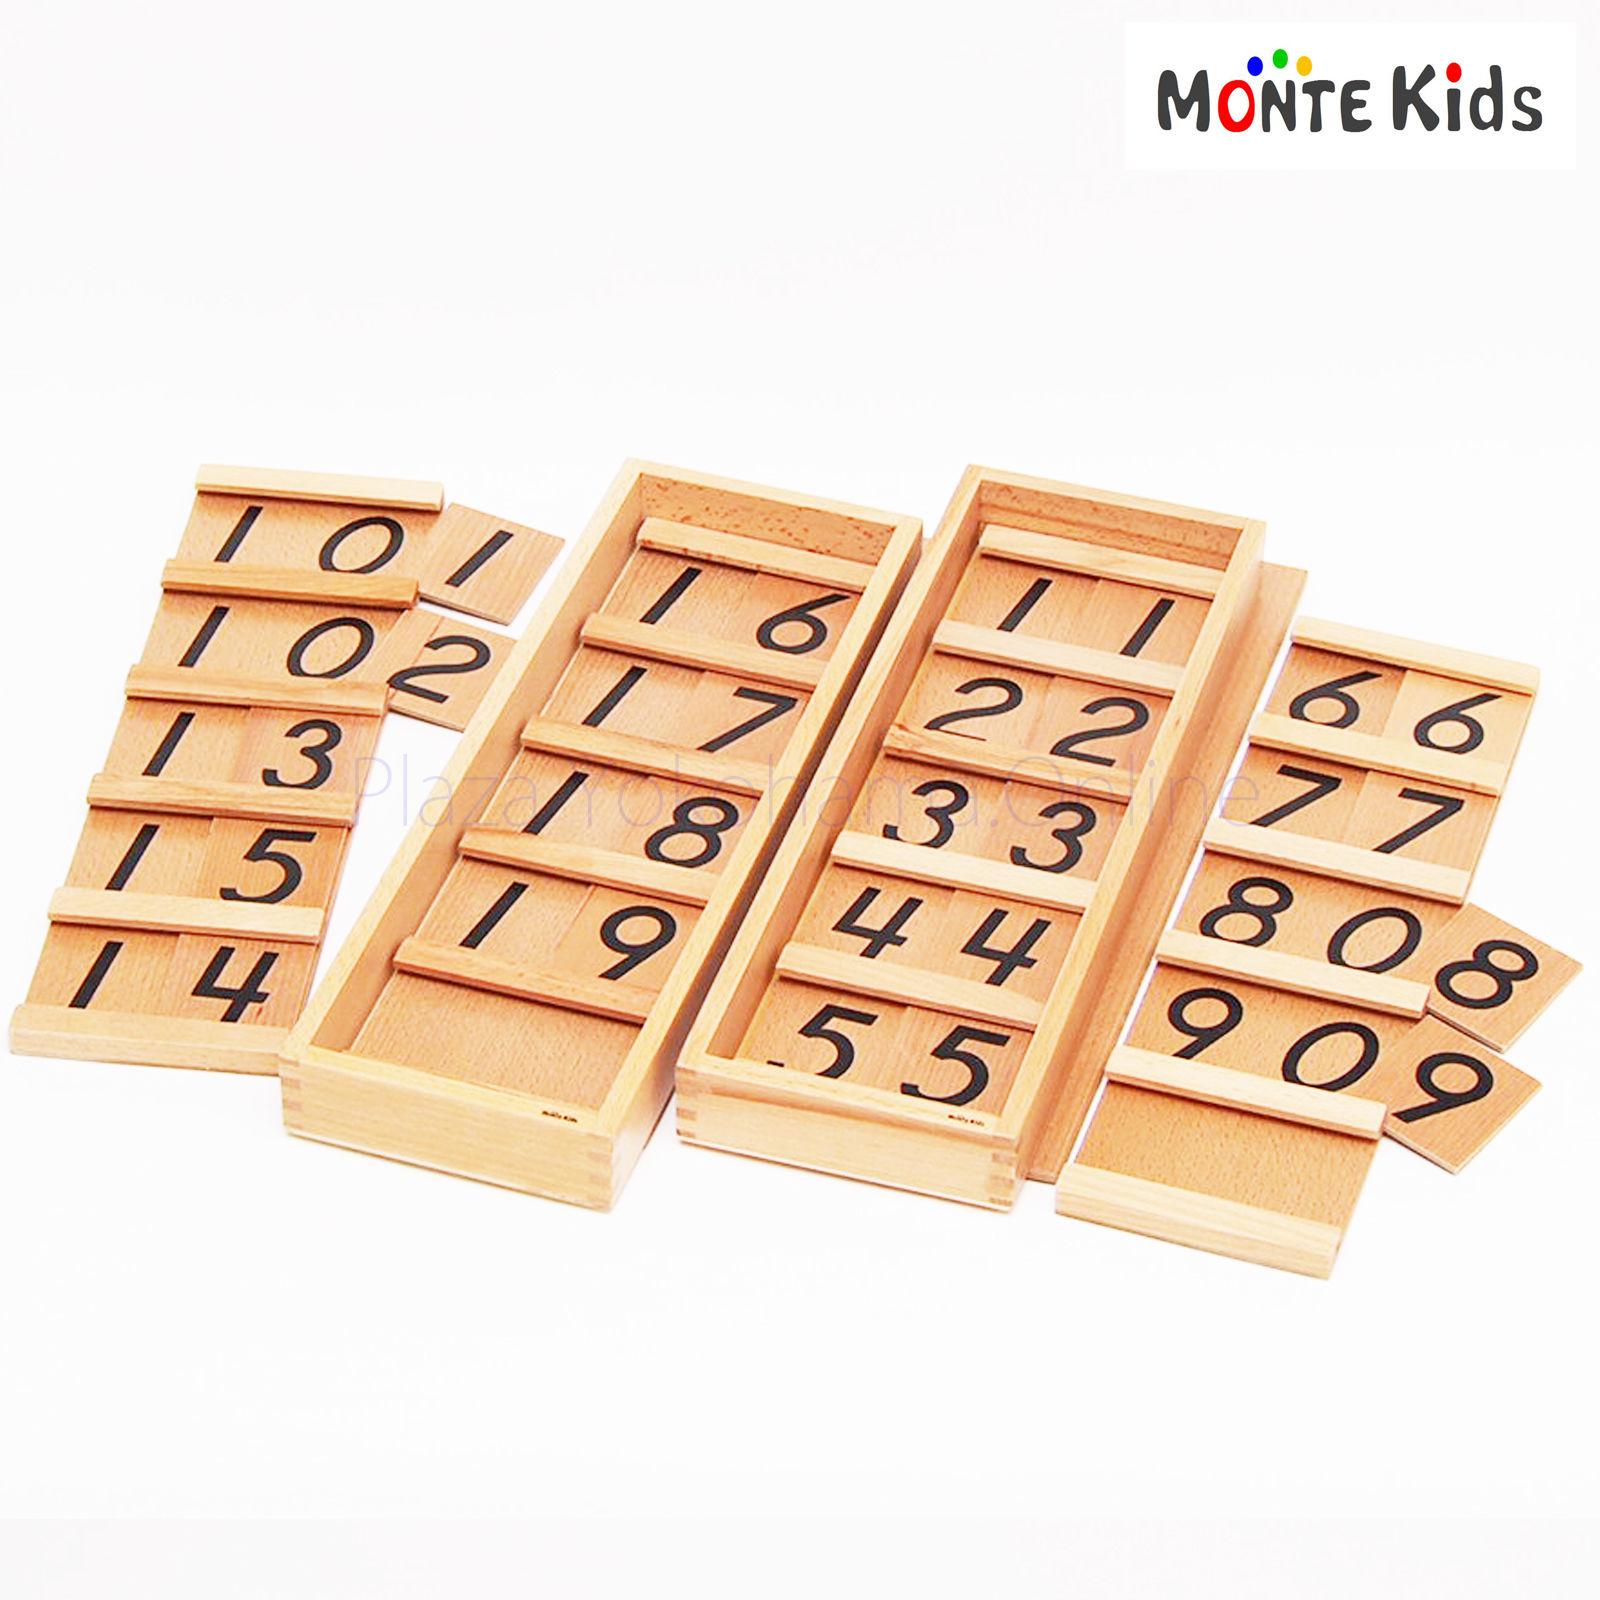 【MONTE Kids】MK-057  セガン板1・2セット  ≪OUTLET≫